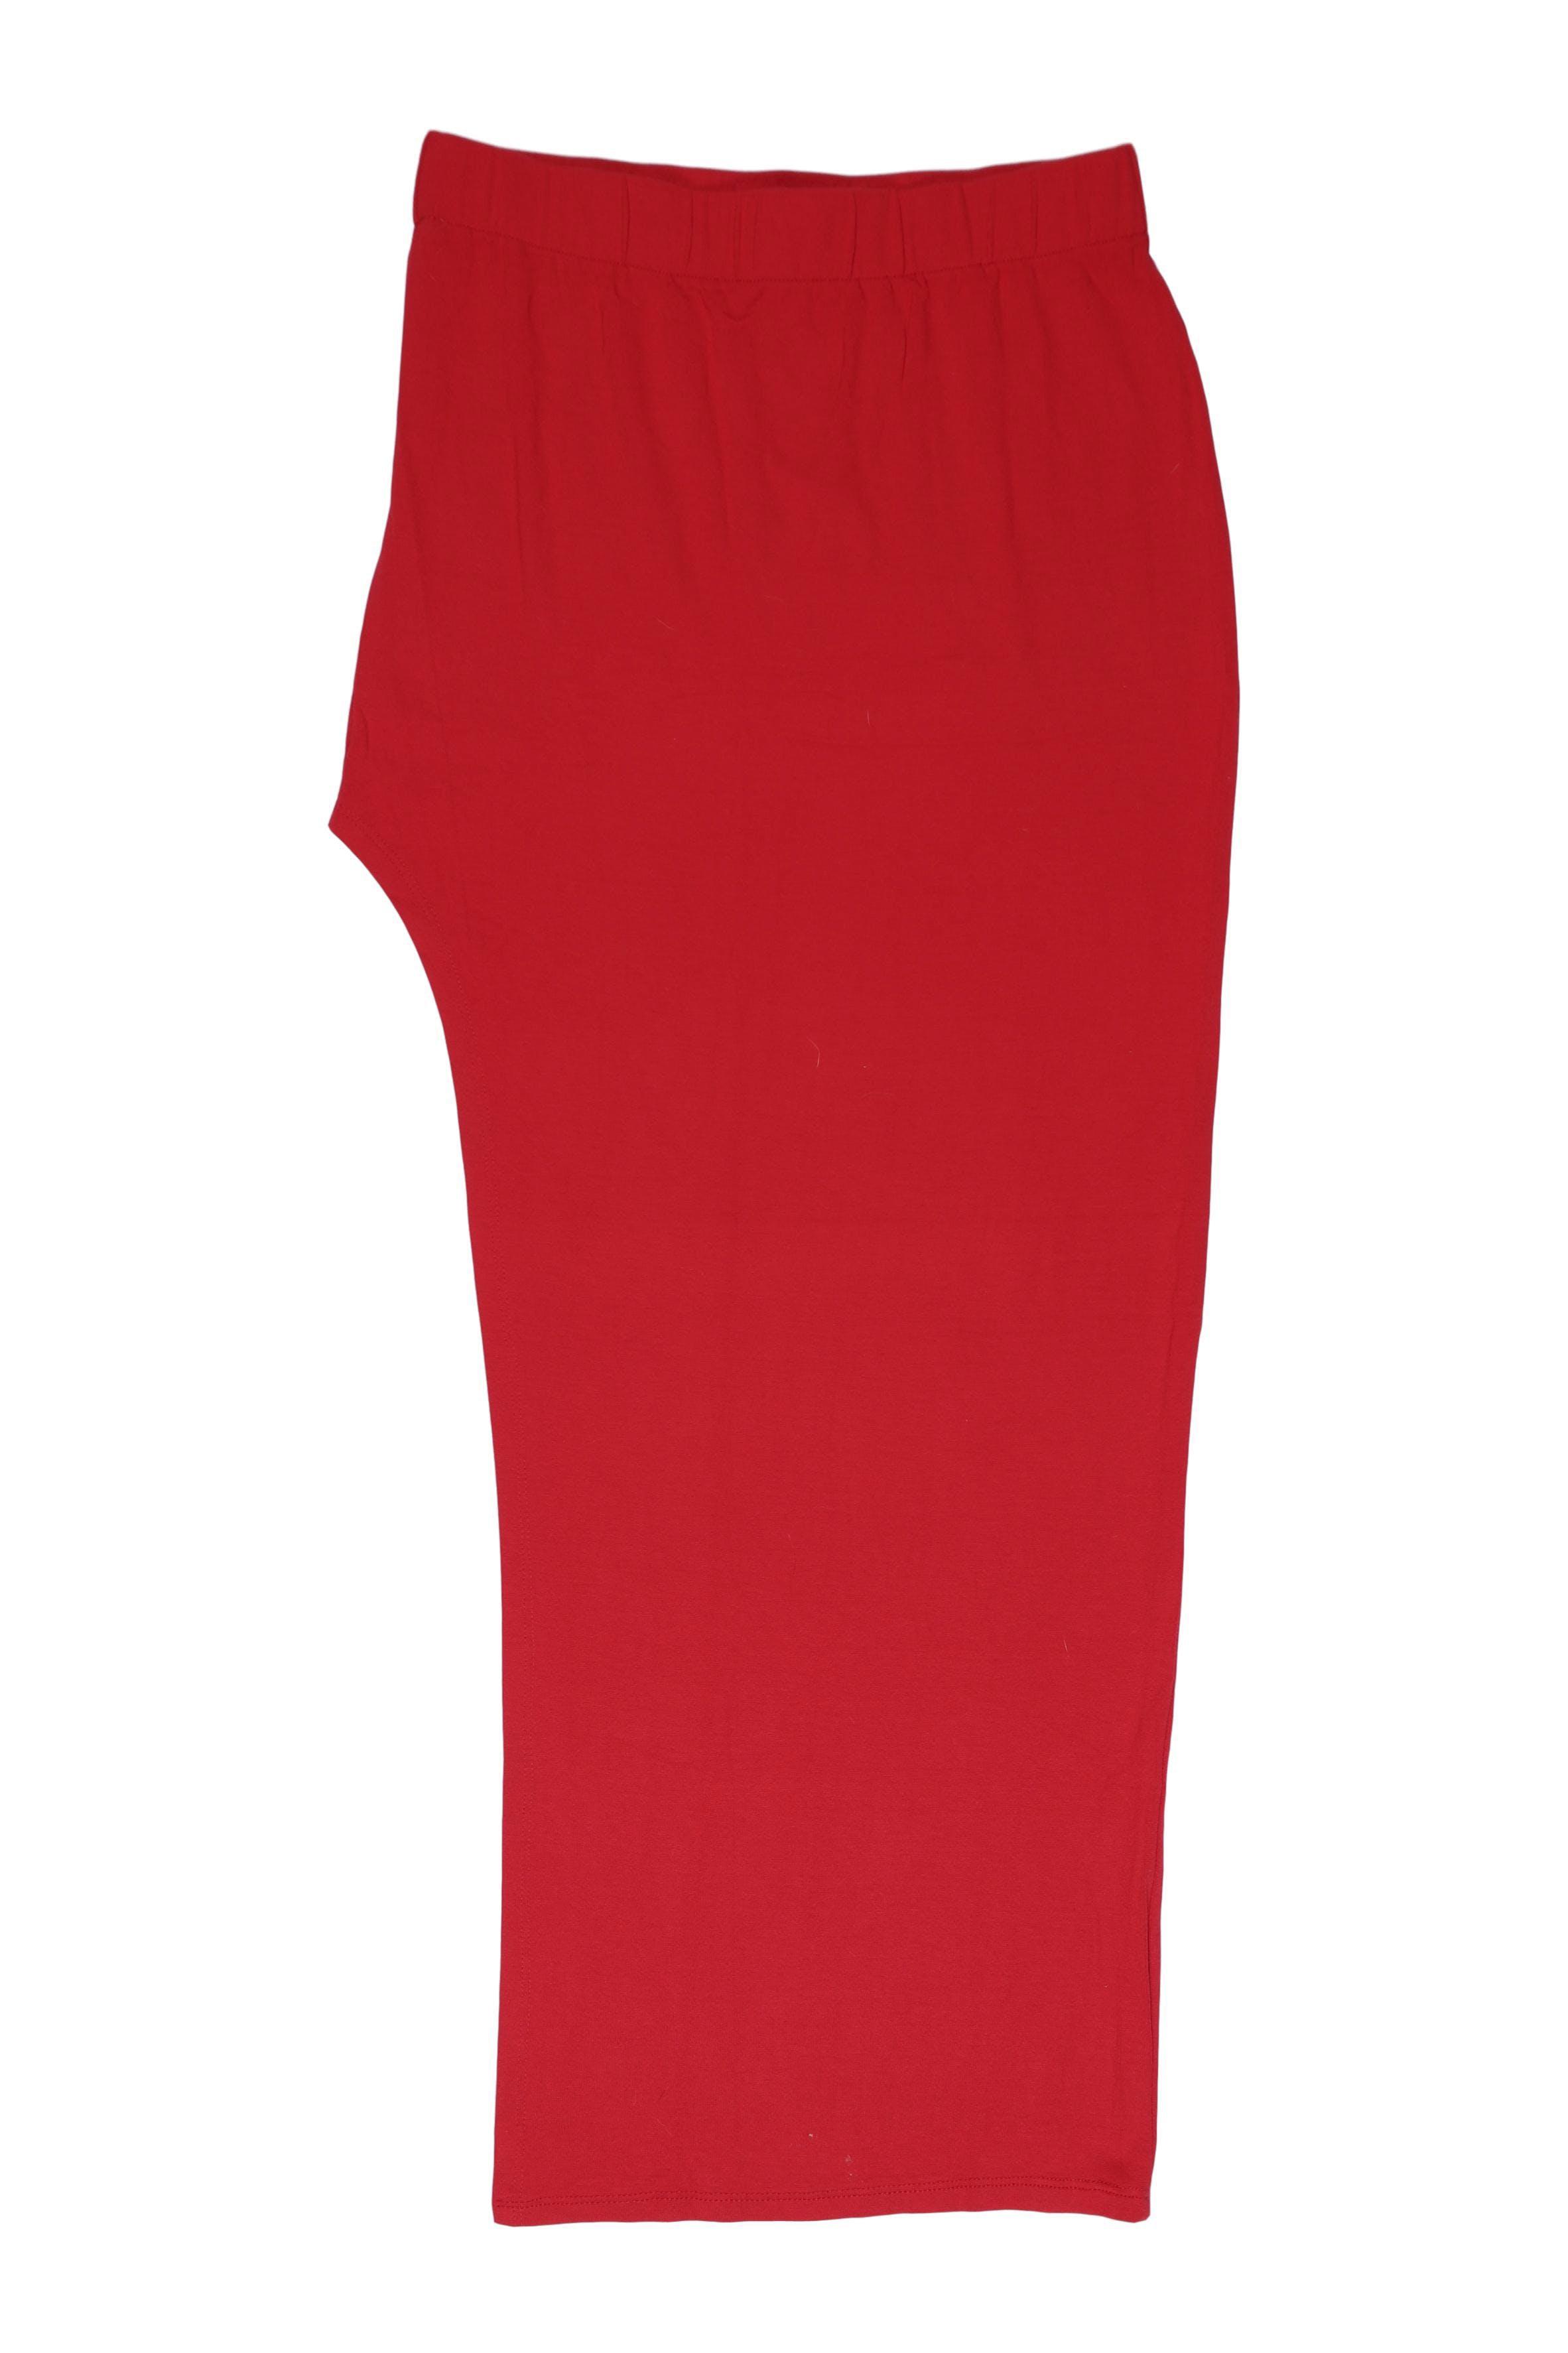 Falda larga roja tipo algodón stretch, asimétrica con abertura lateral